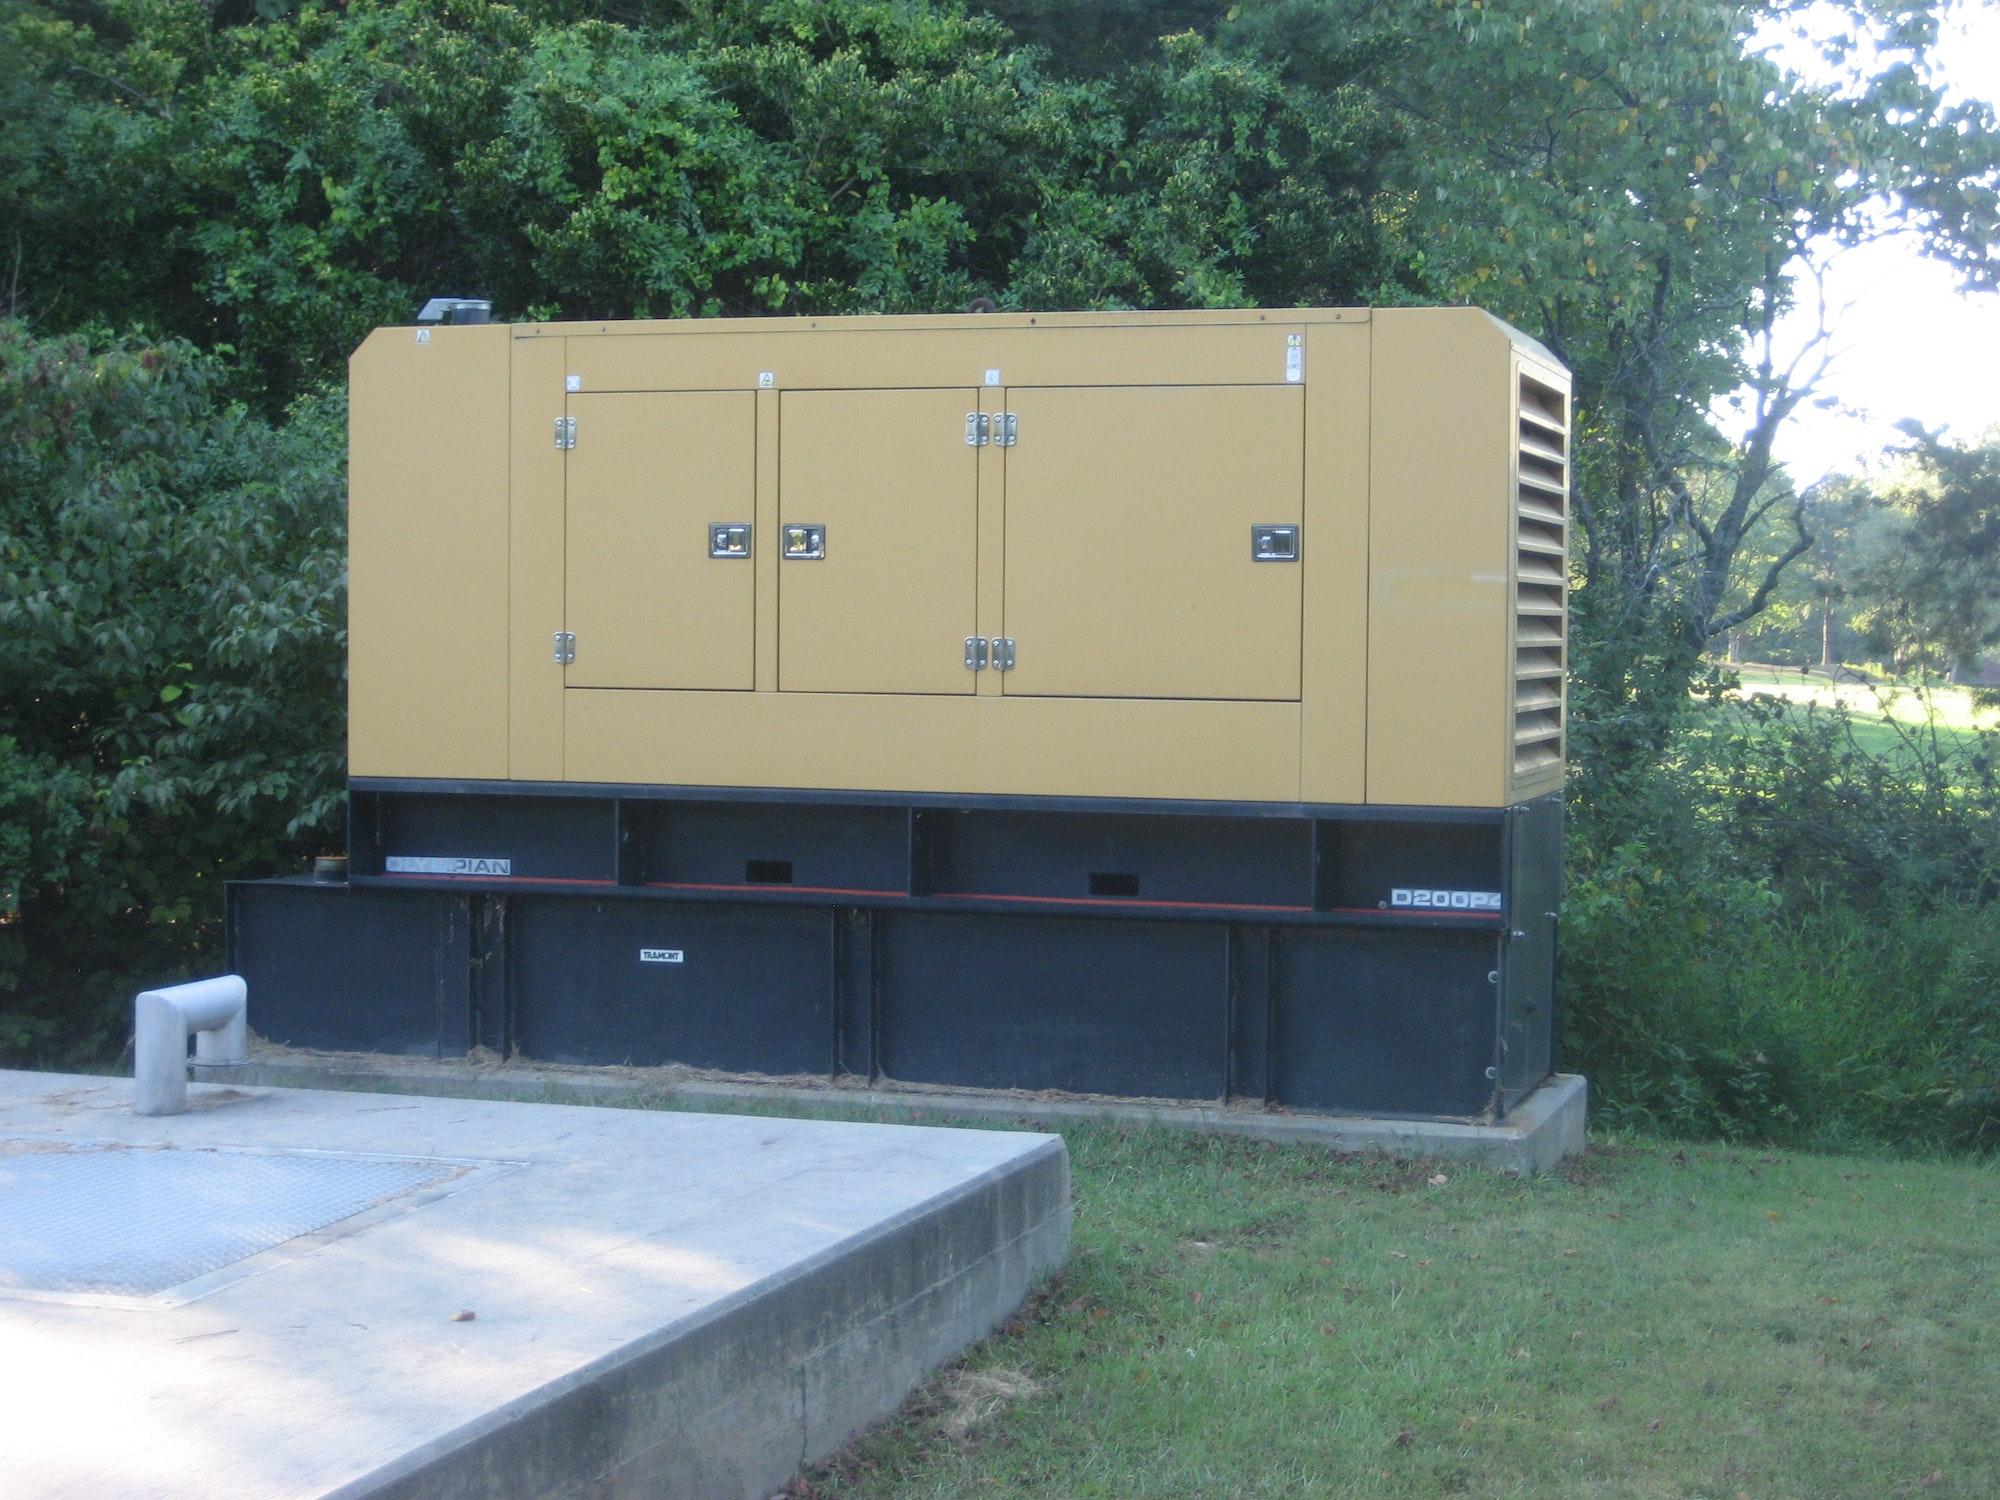 May contain: machine and generator